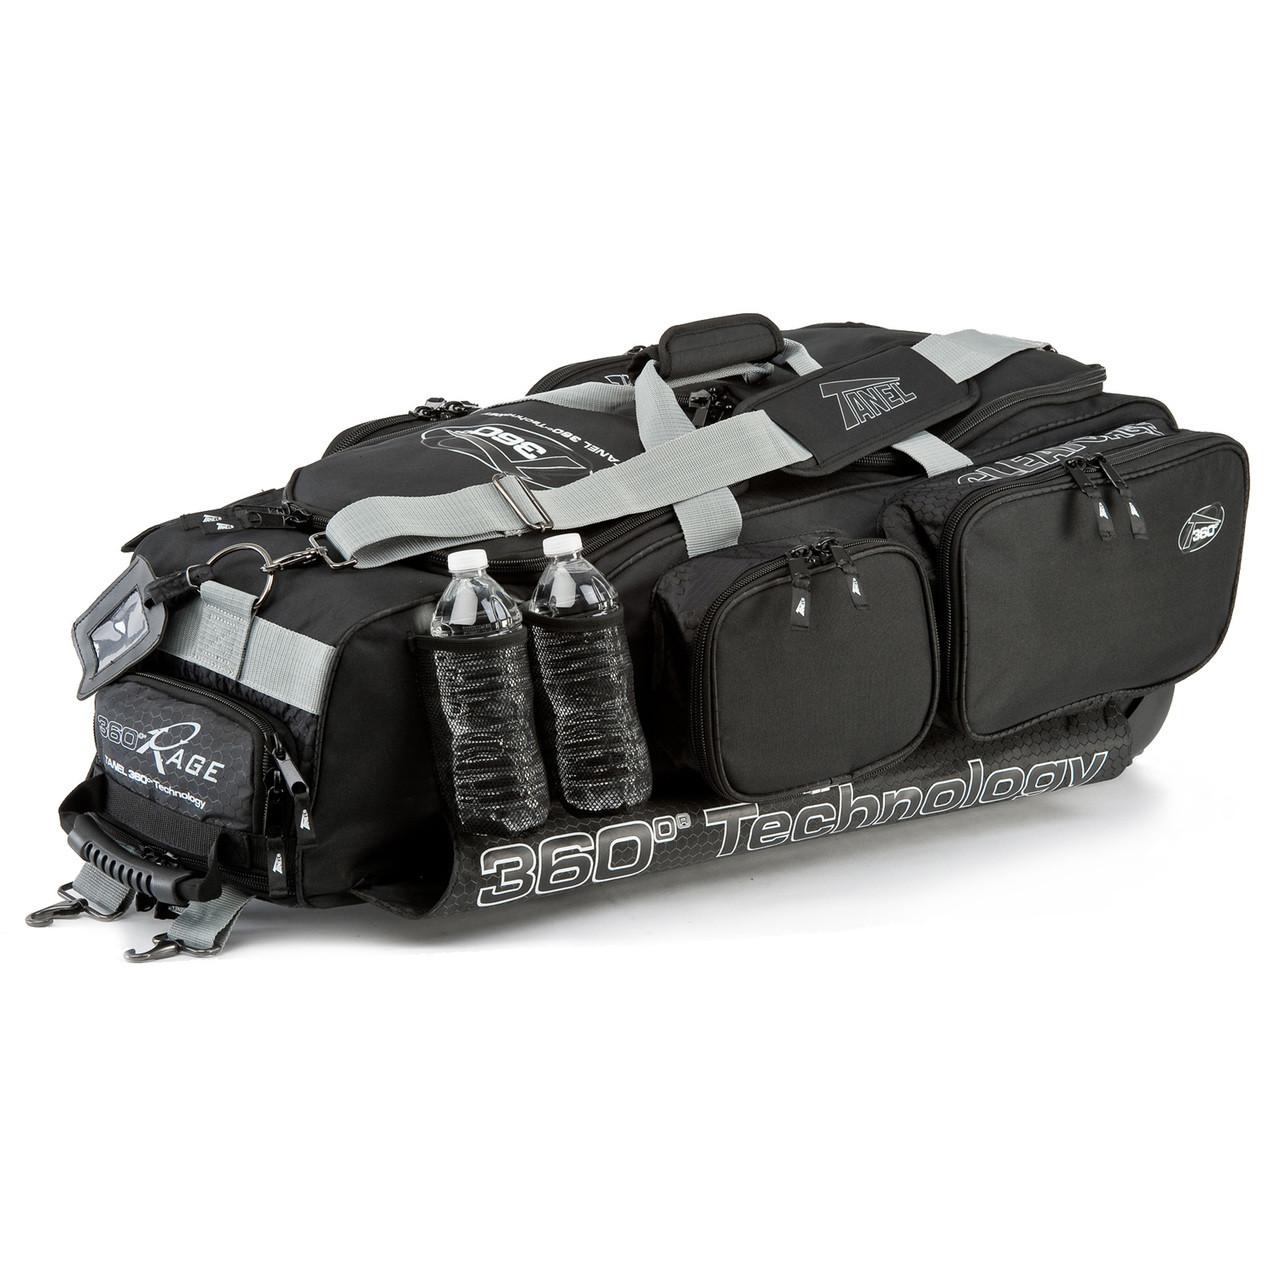 Black Rage Bag